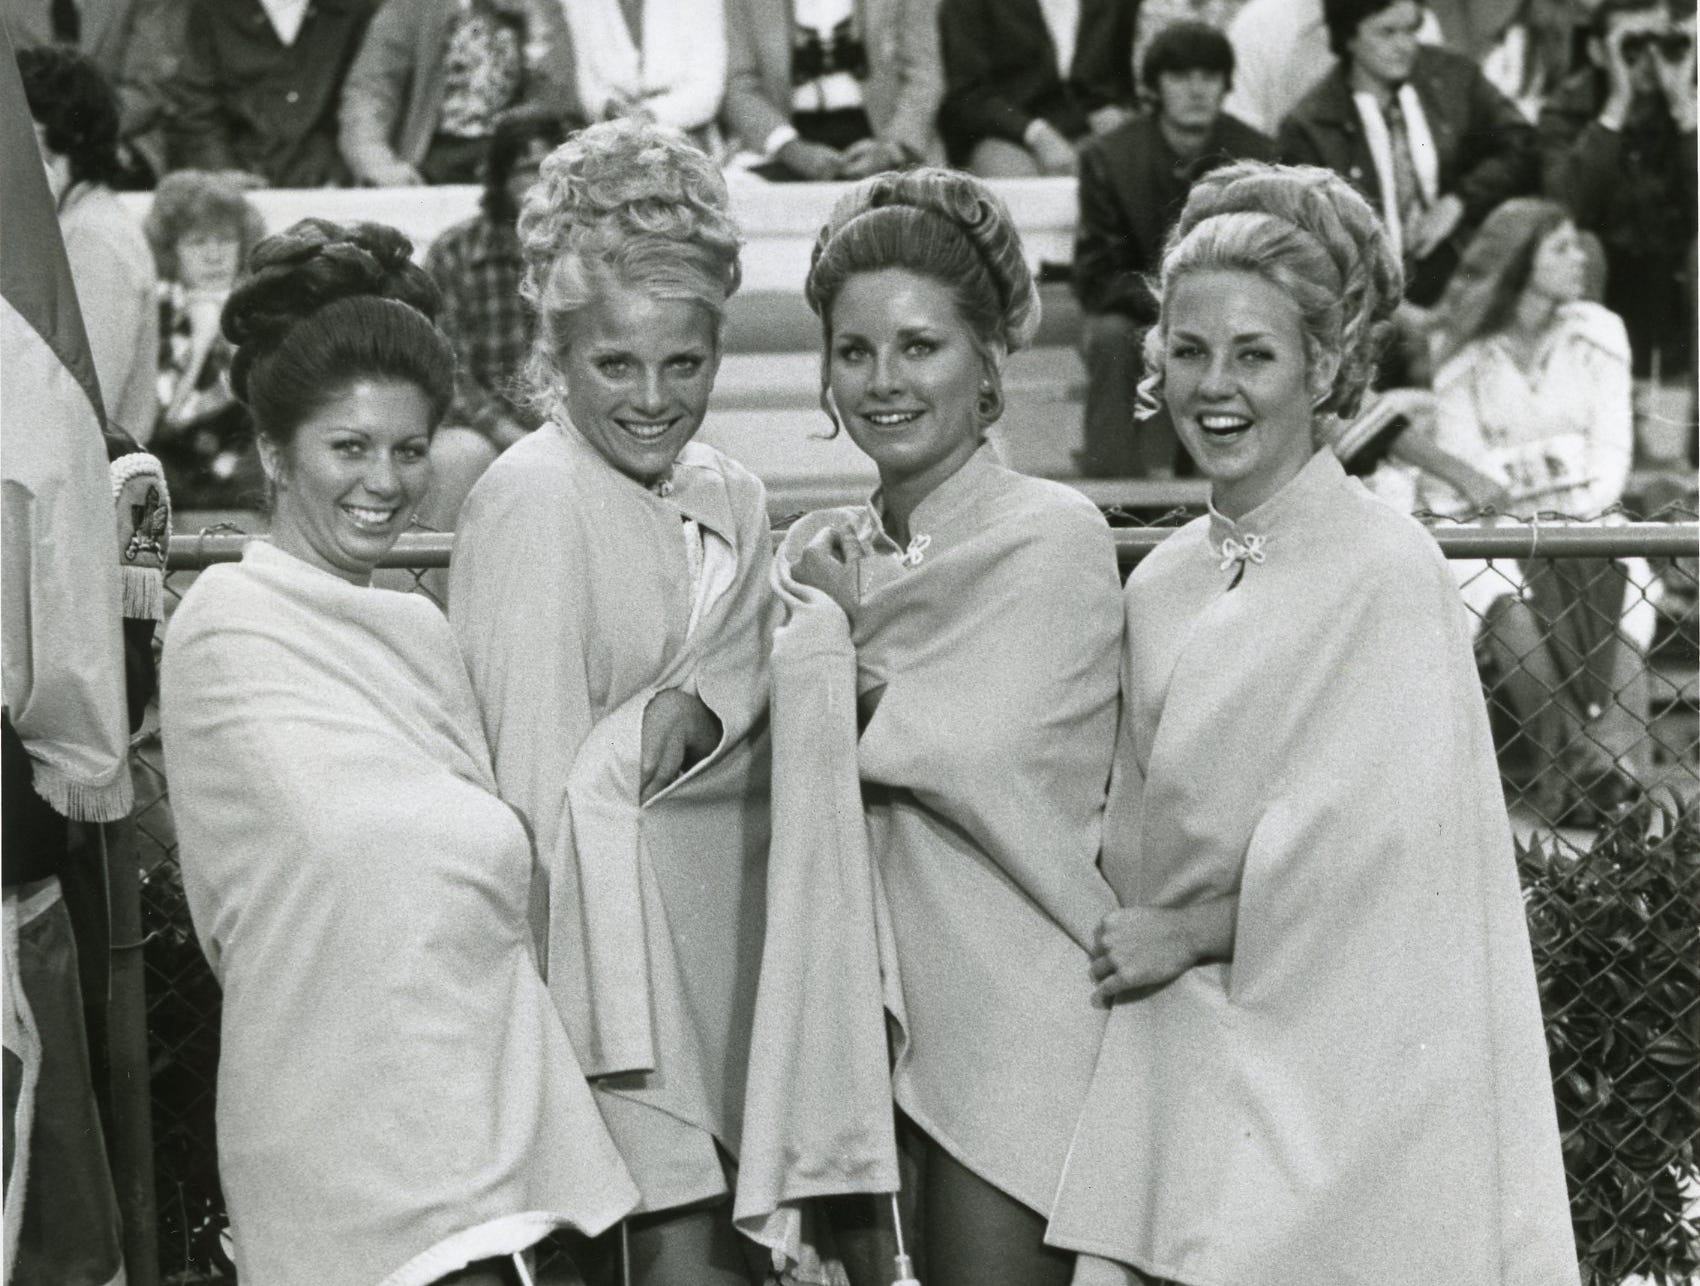 UT majorettes Marsha Cole, Susan Huntington, Kathy McCarrell and Carolyn Bell, September 1974.